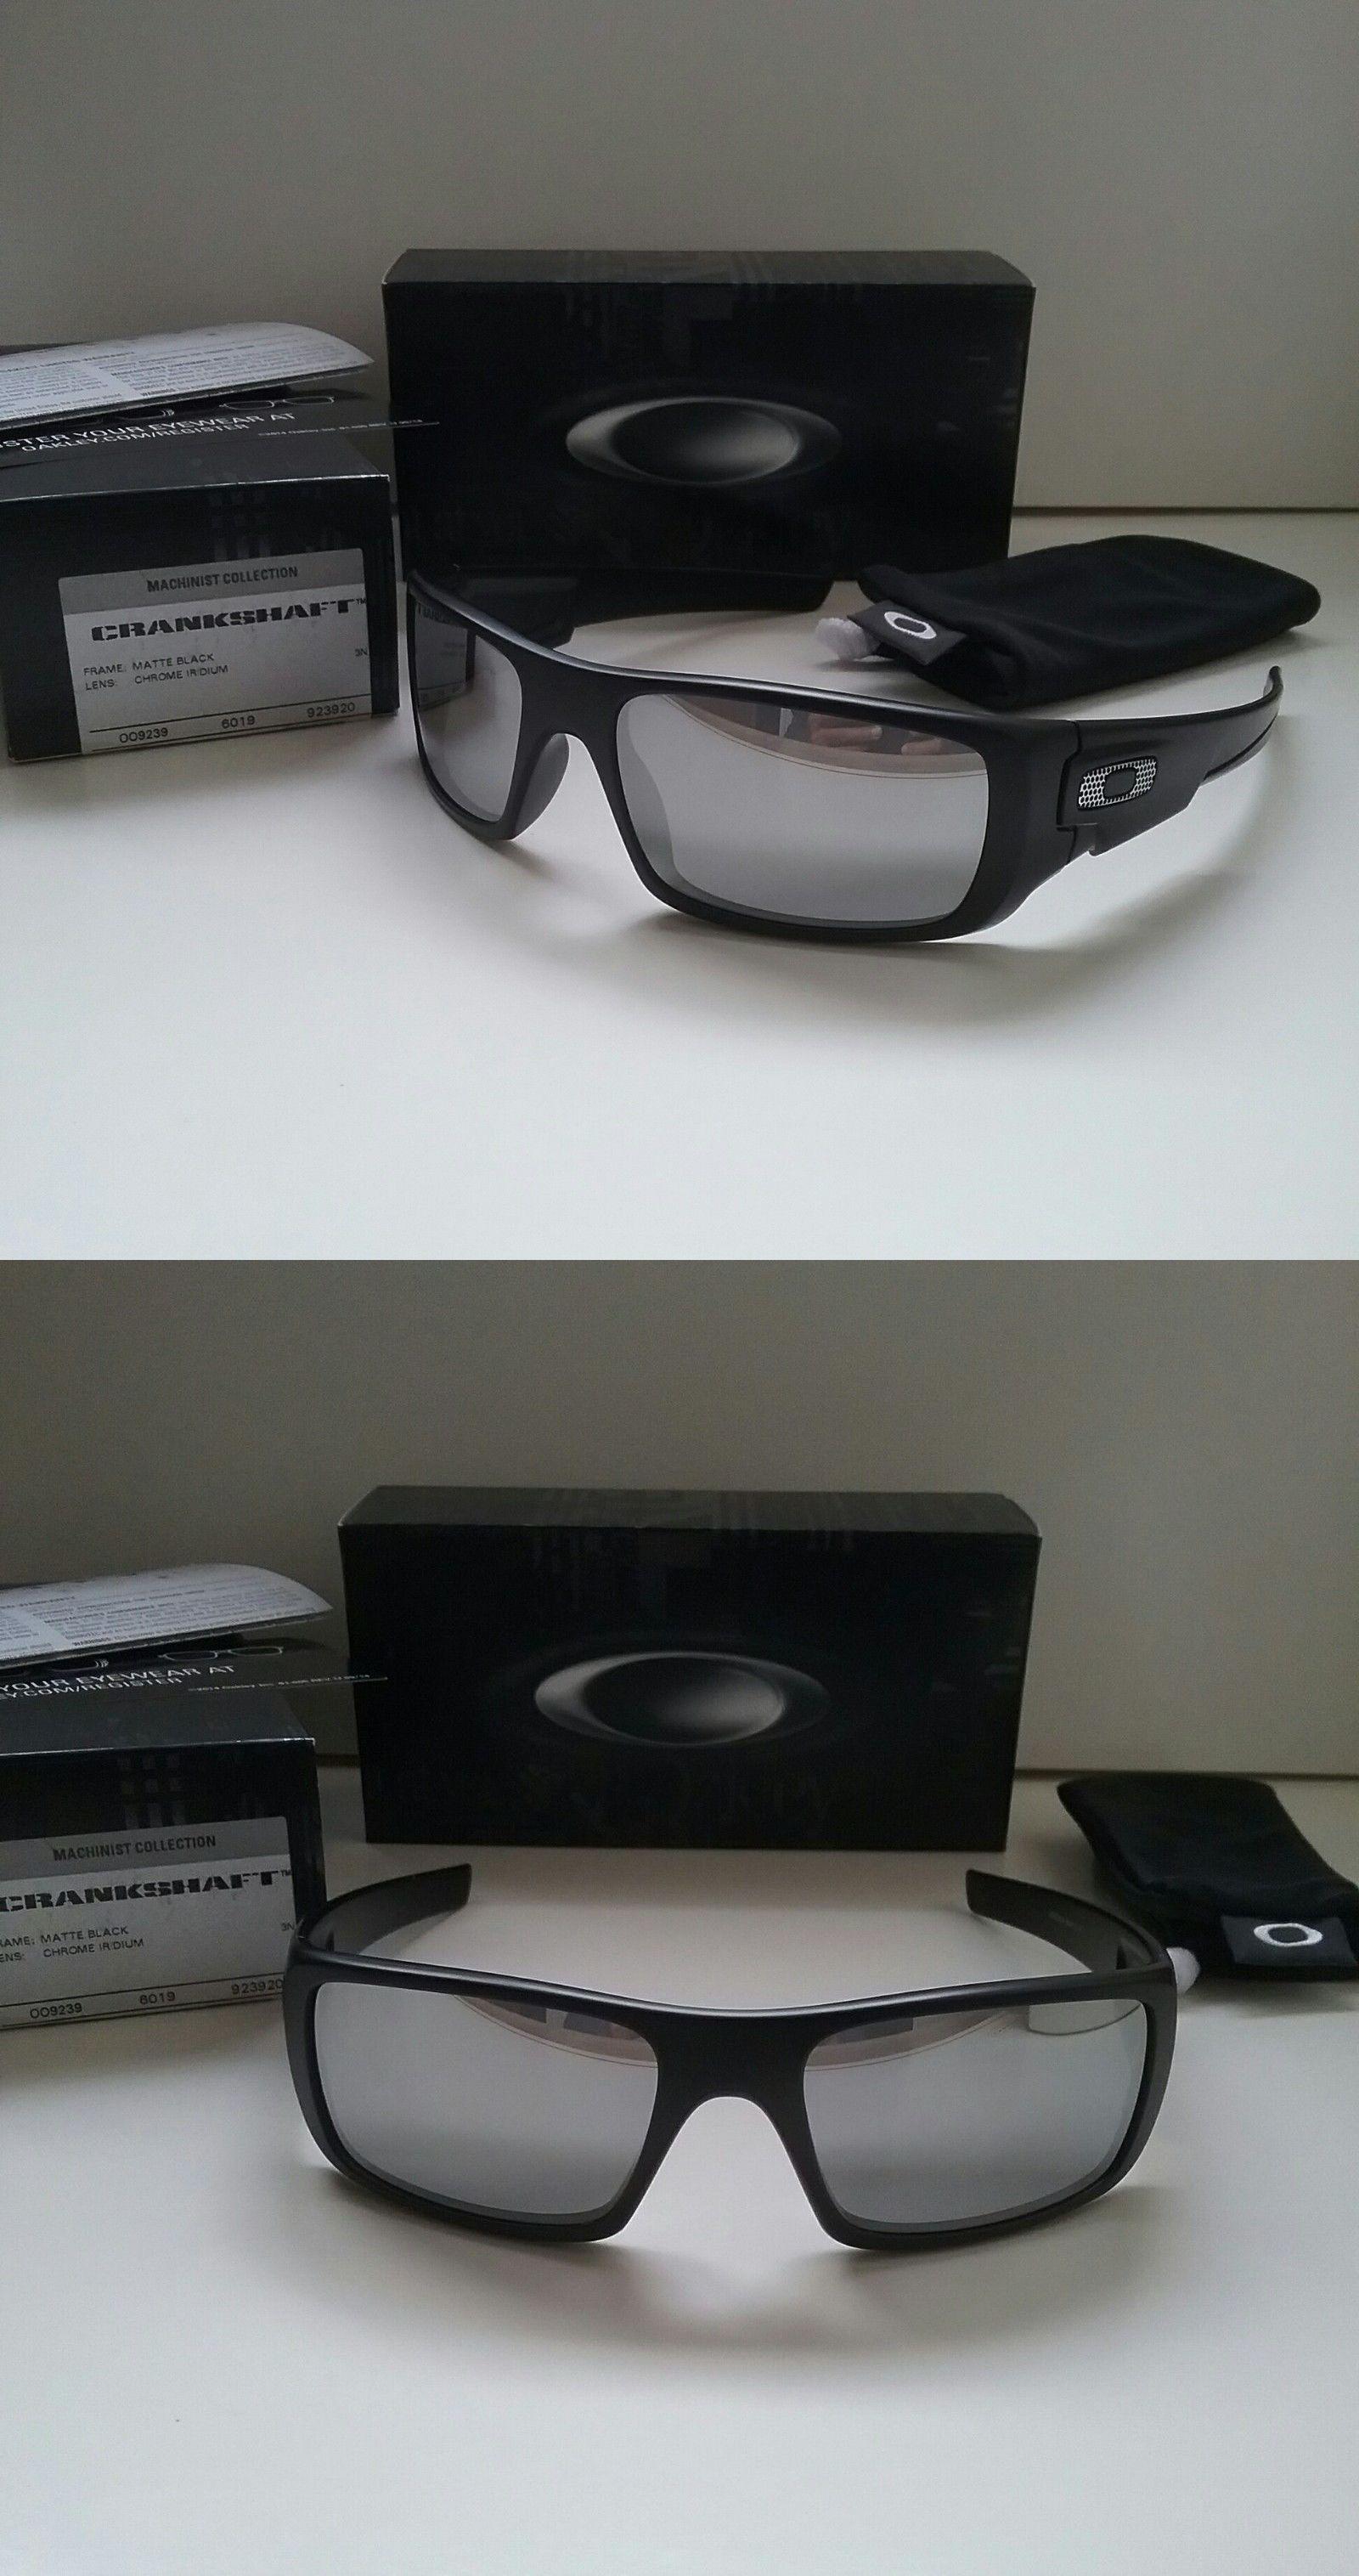 3543a3870a5 ... australia sunglasses 79720 new oakley crankshaft machinist coll. matte  black chrome sunglasses fuel cell 02a50